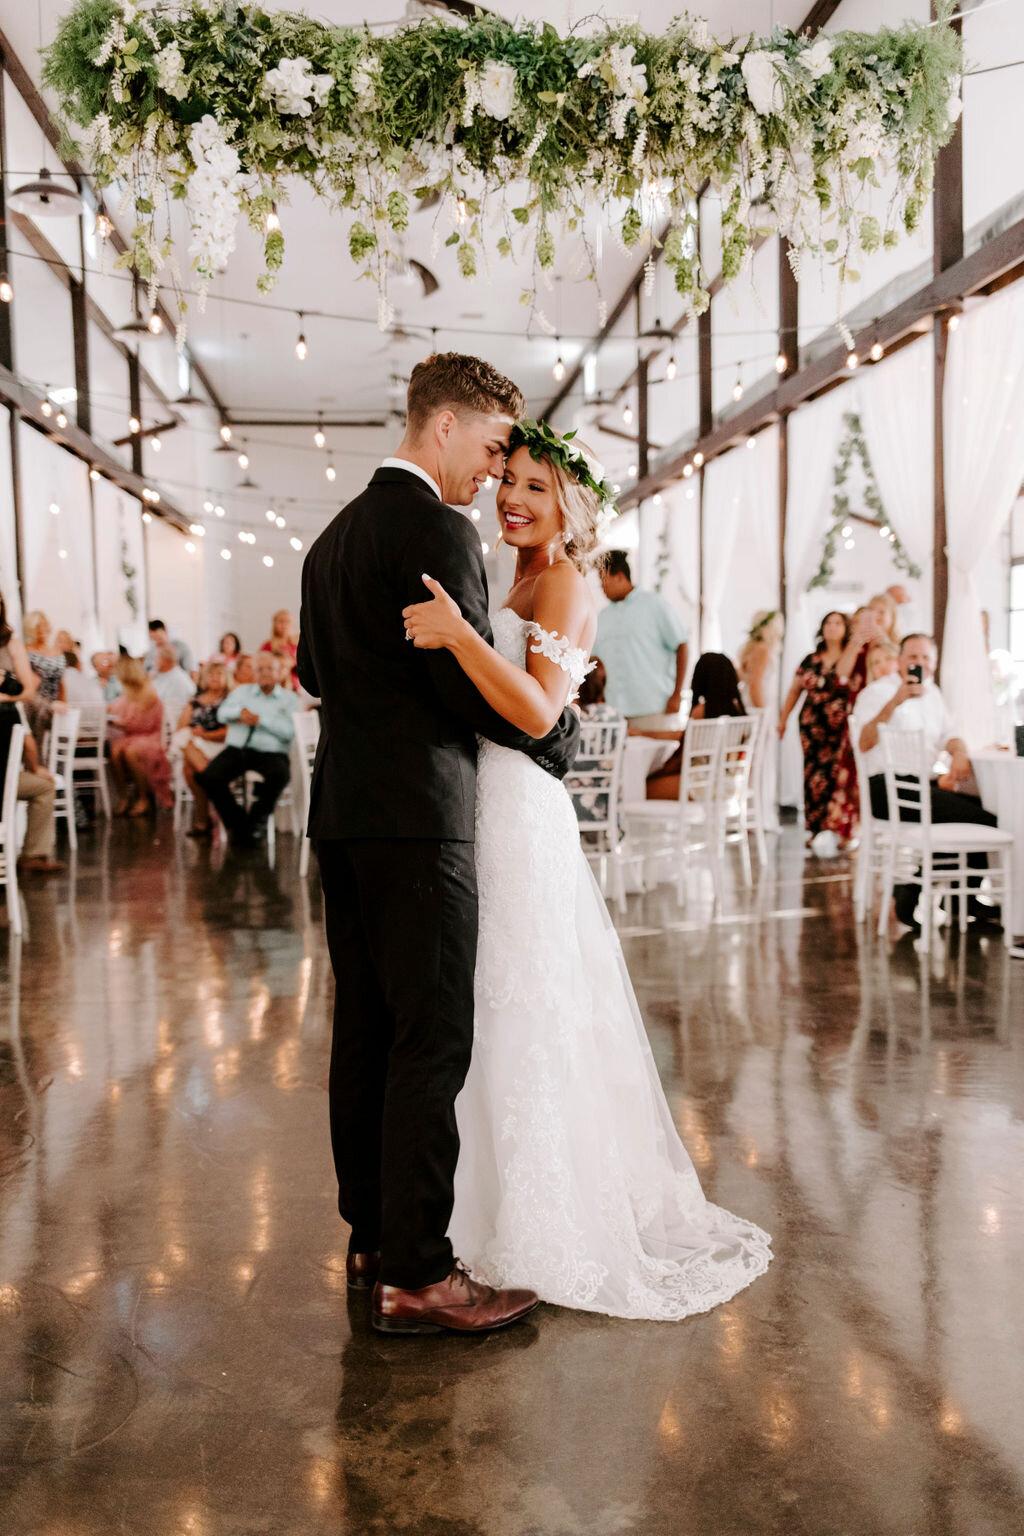 Tulsa White Barn Wedding Venue Outdoor Ceremony 123.jpg